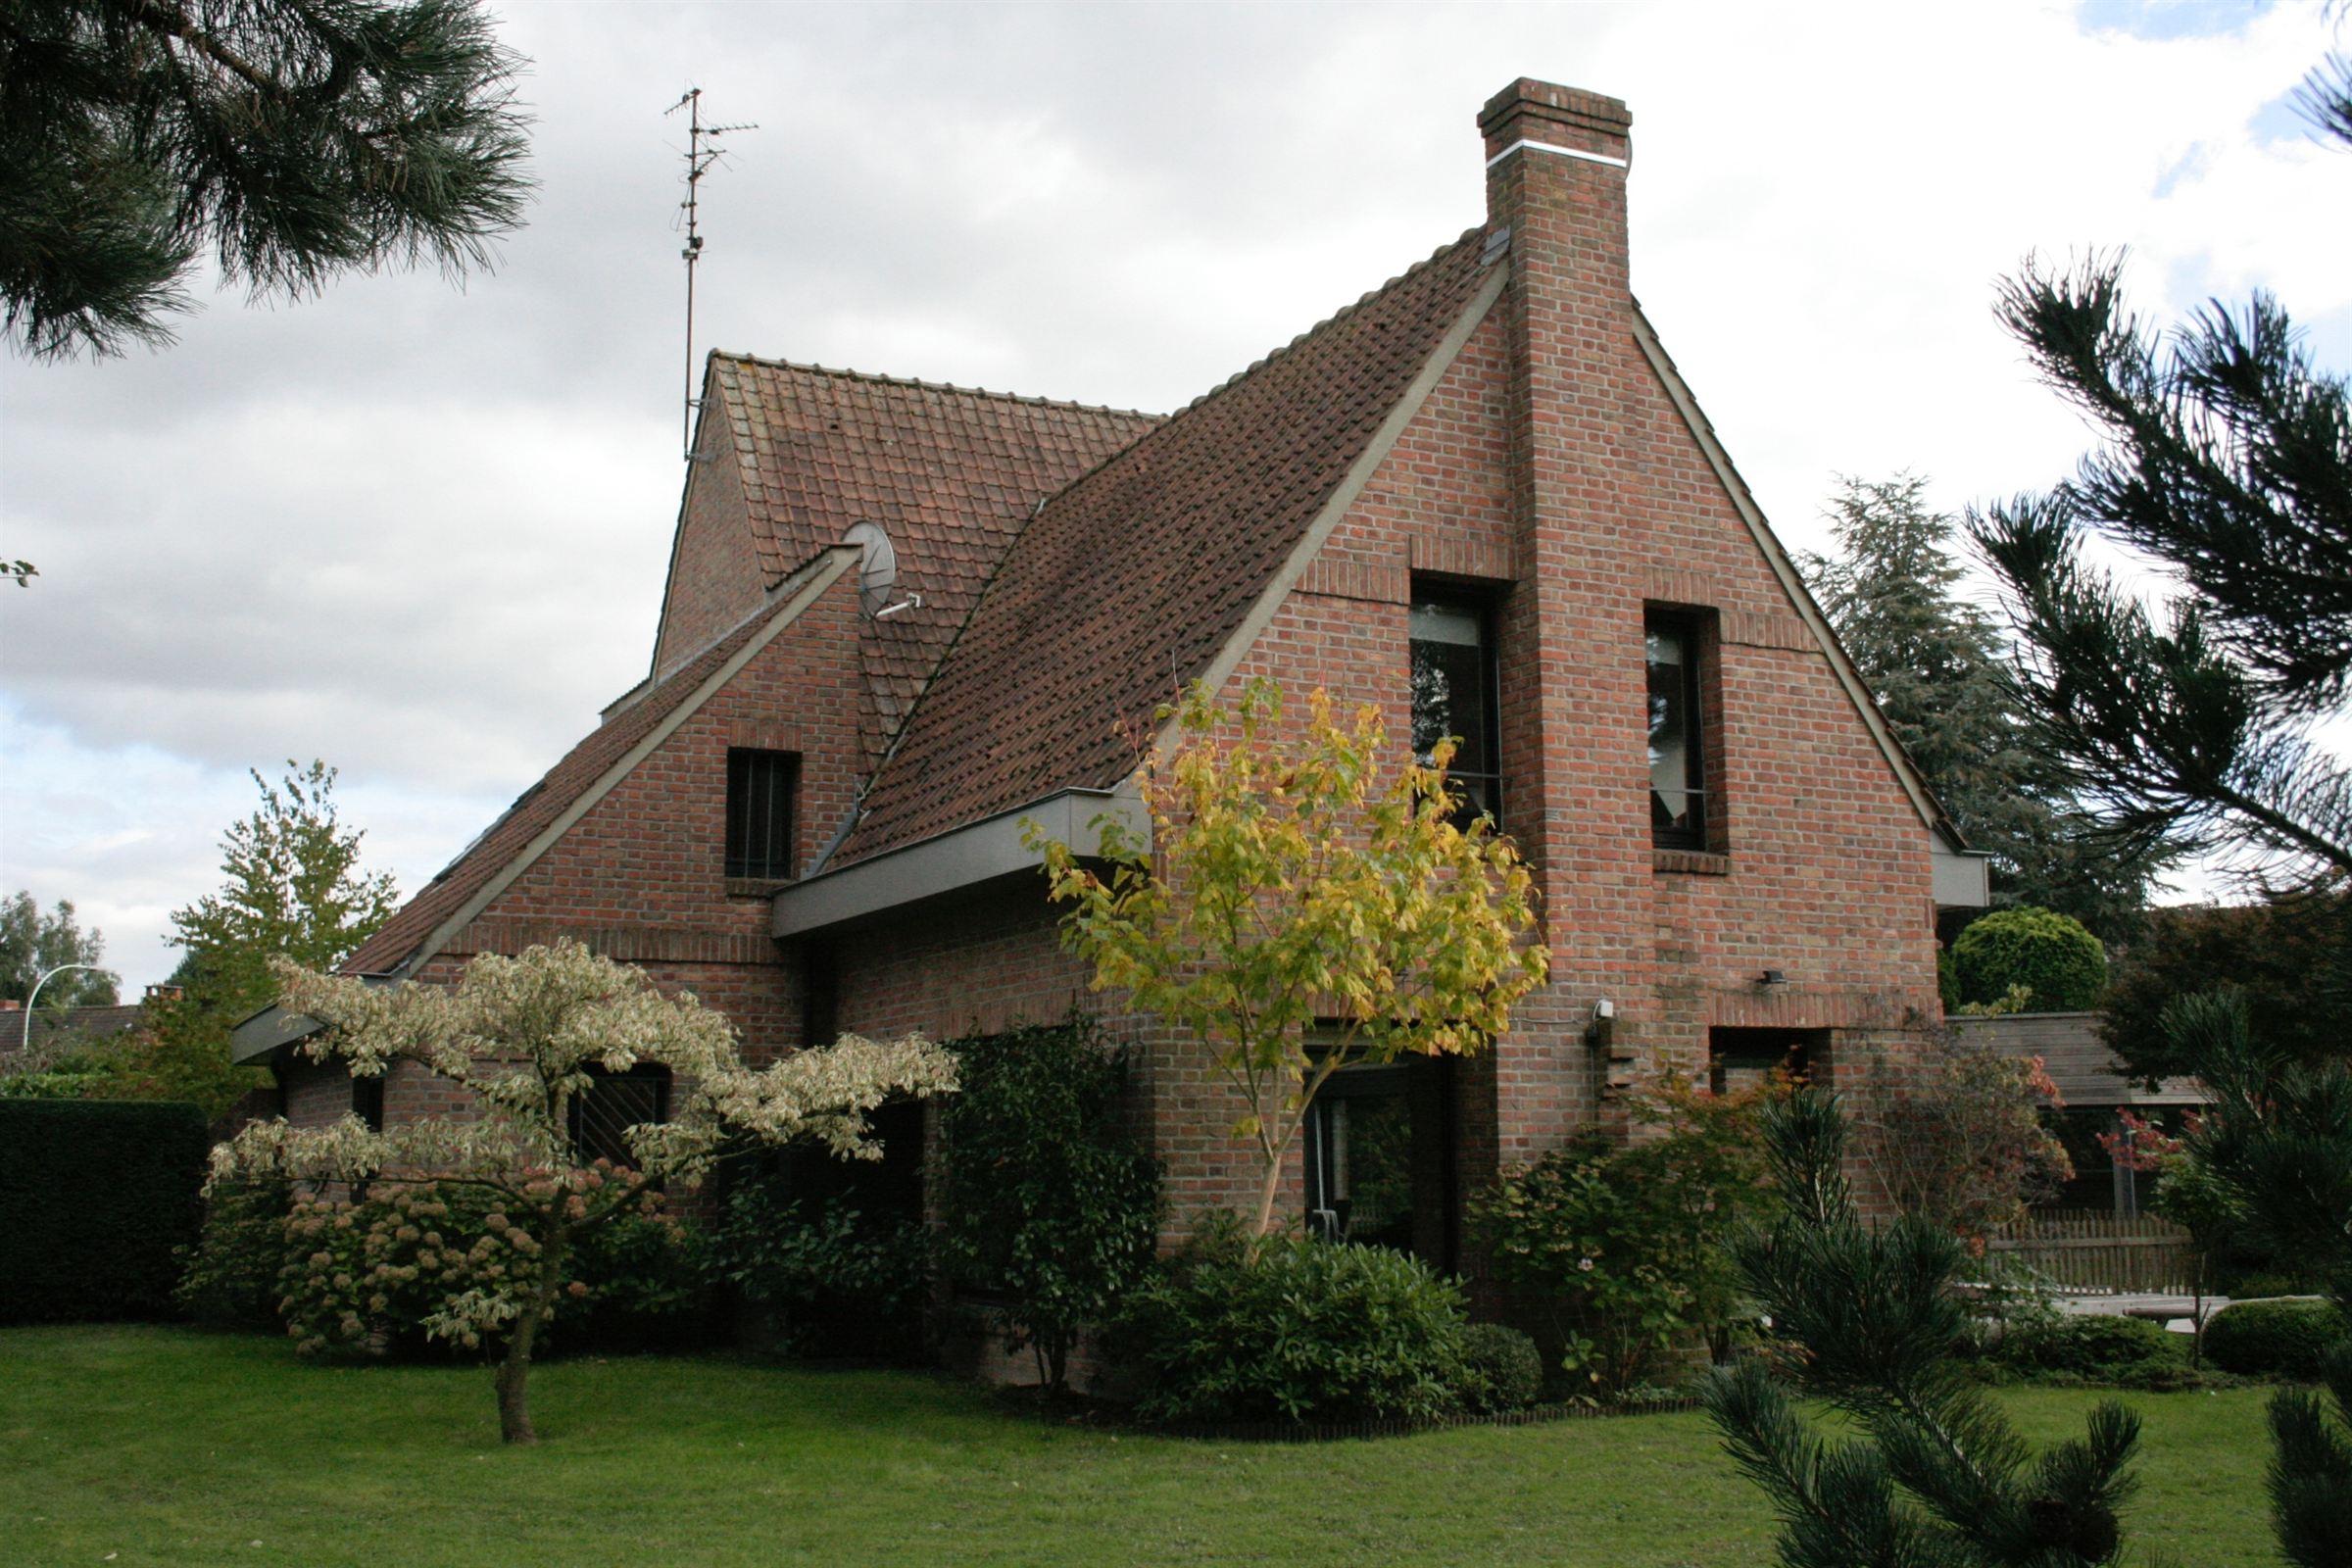 Property For Sale at VILLENEUVE D'ASCQ, Beautiful family home 200m² hab. 5 ch.